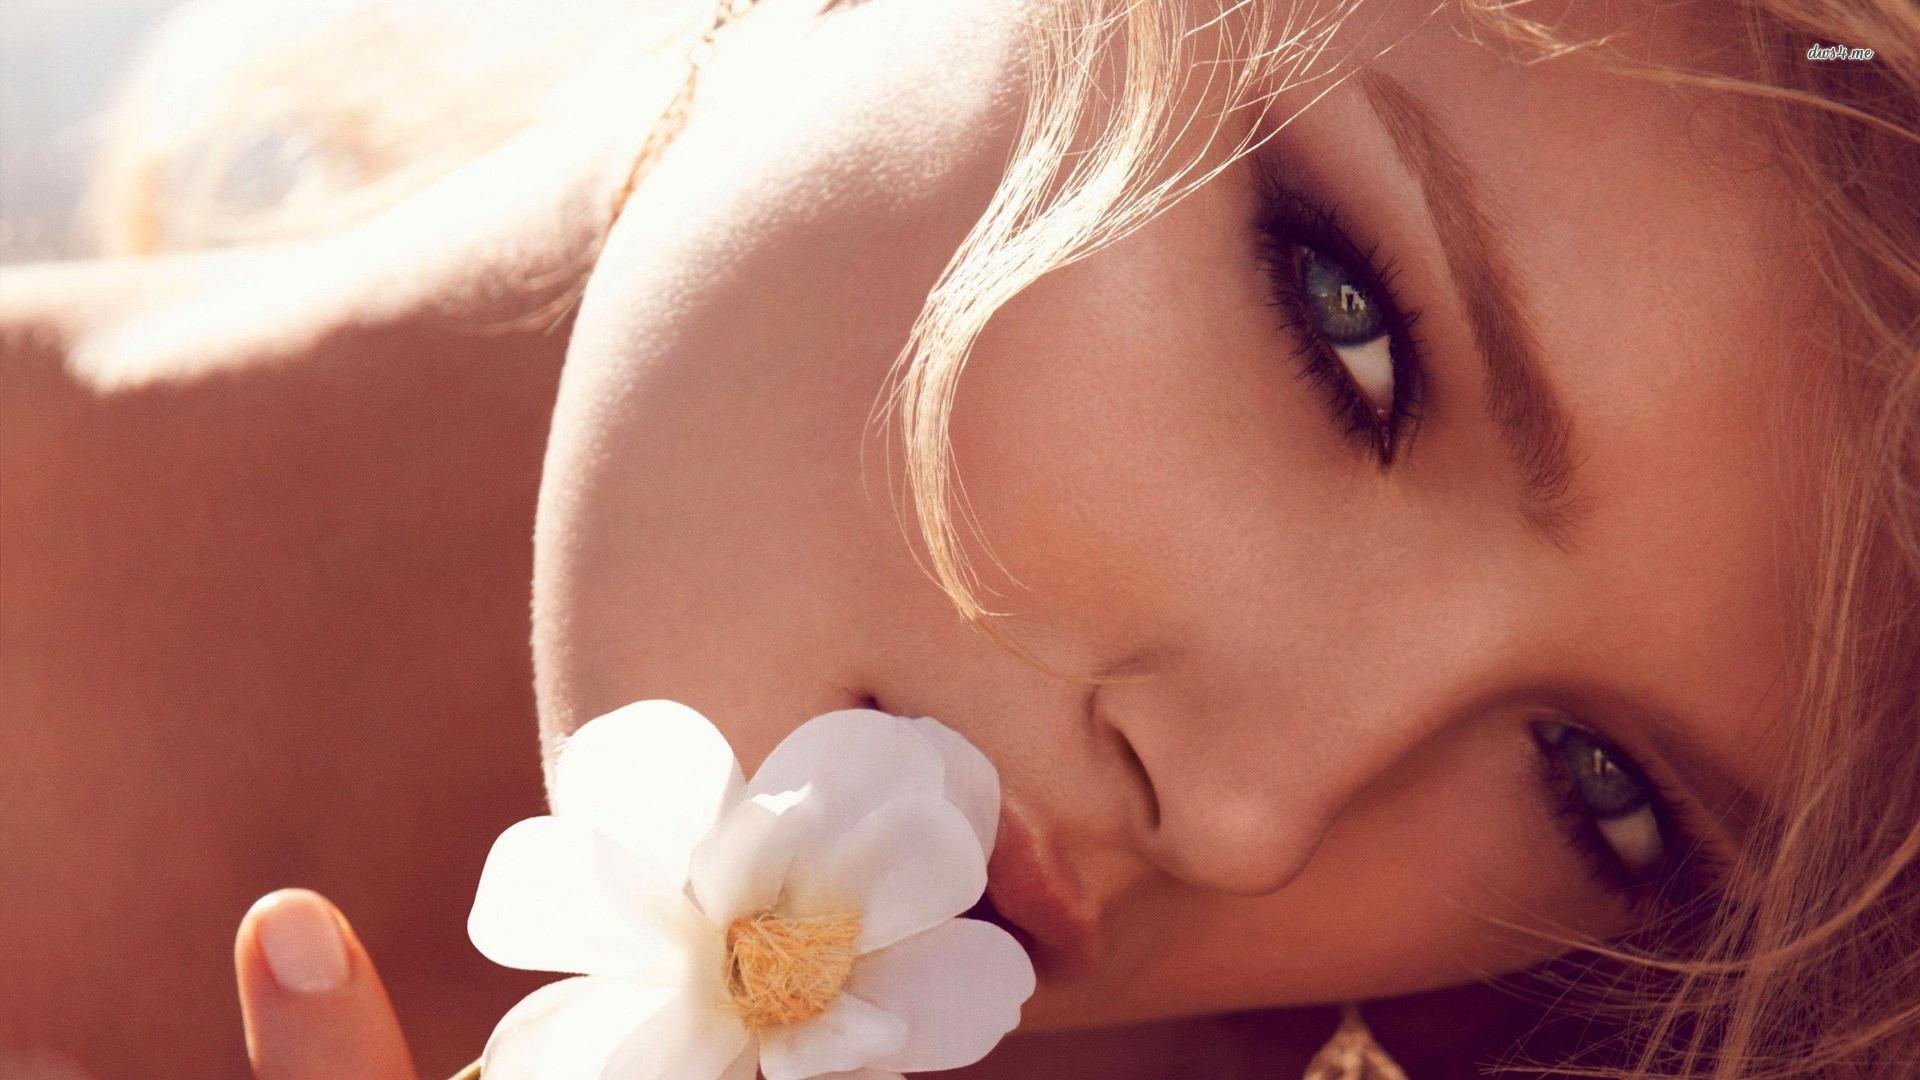 26619-blonde-holding-a-blossom-1920x1080-girl-wallpaper